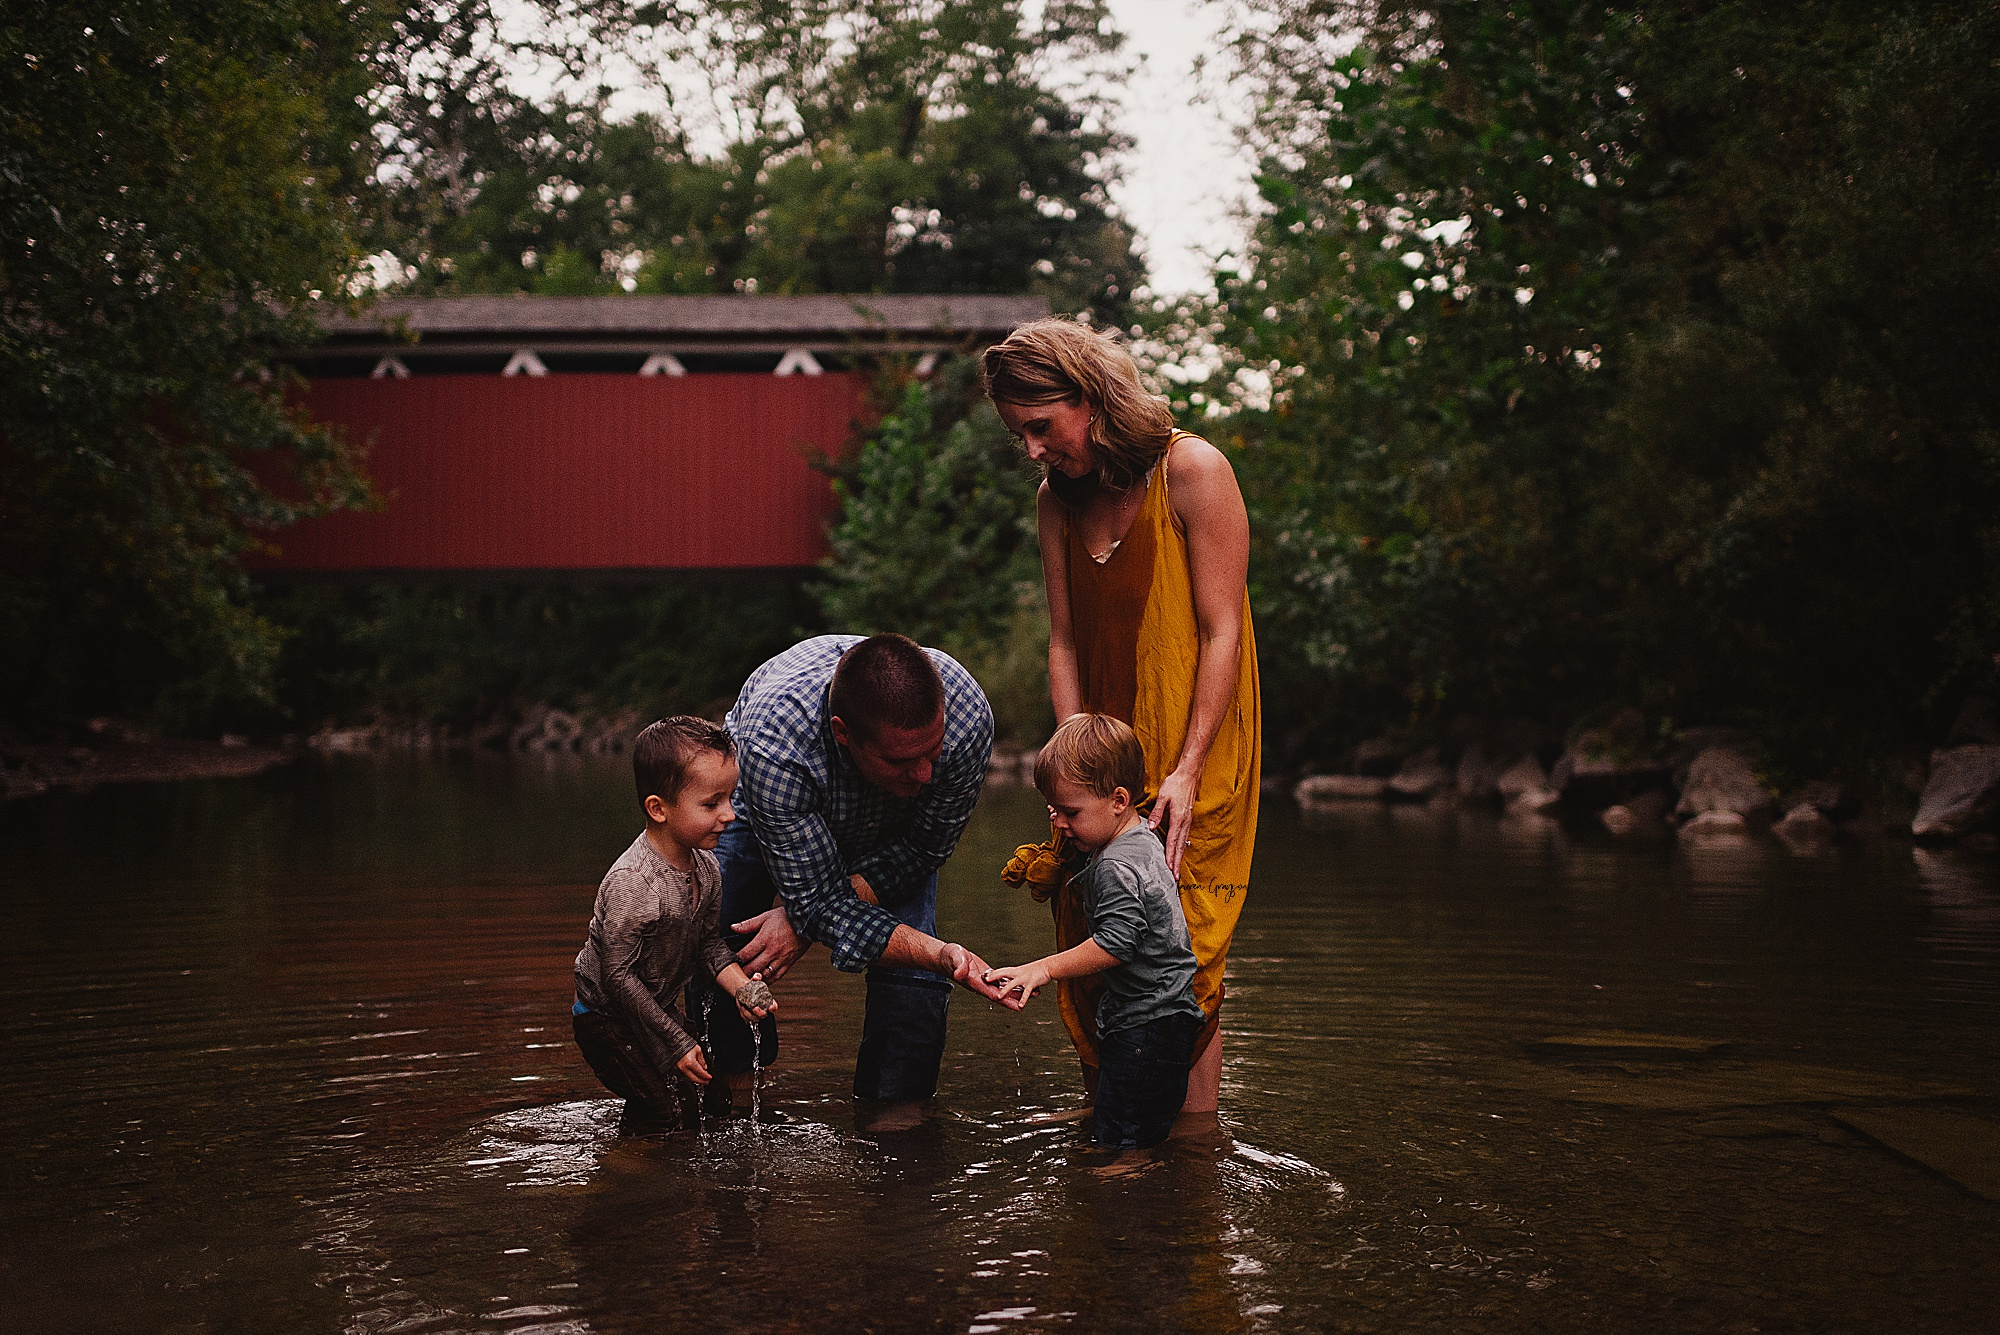 lauren-grayson-photography-akron-ohio-family-mom-boys-field-spring-outdoor-session_0035.jpg